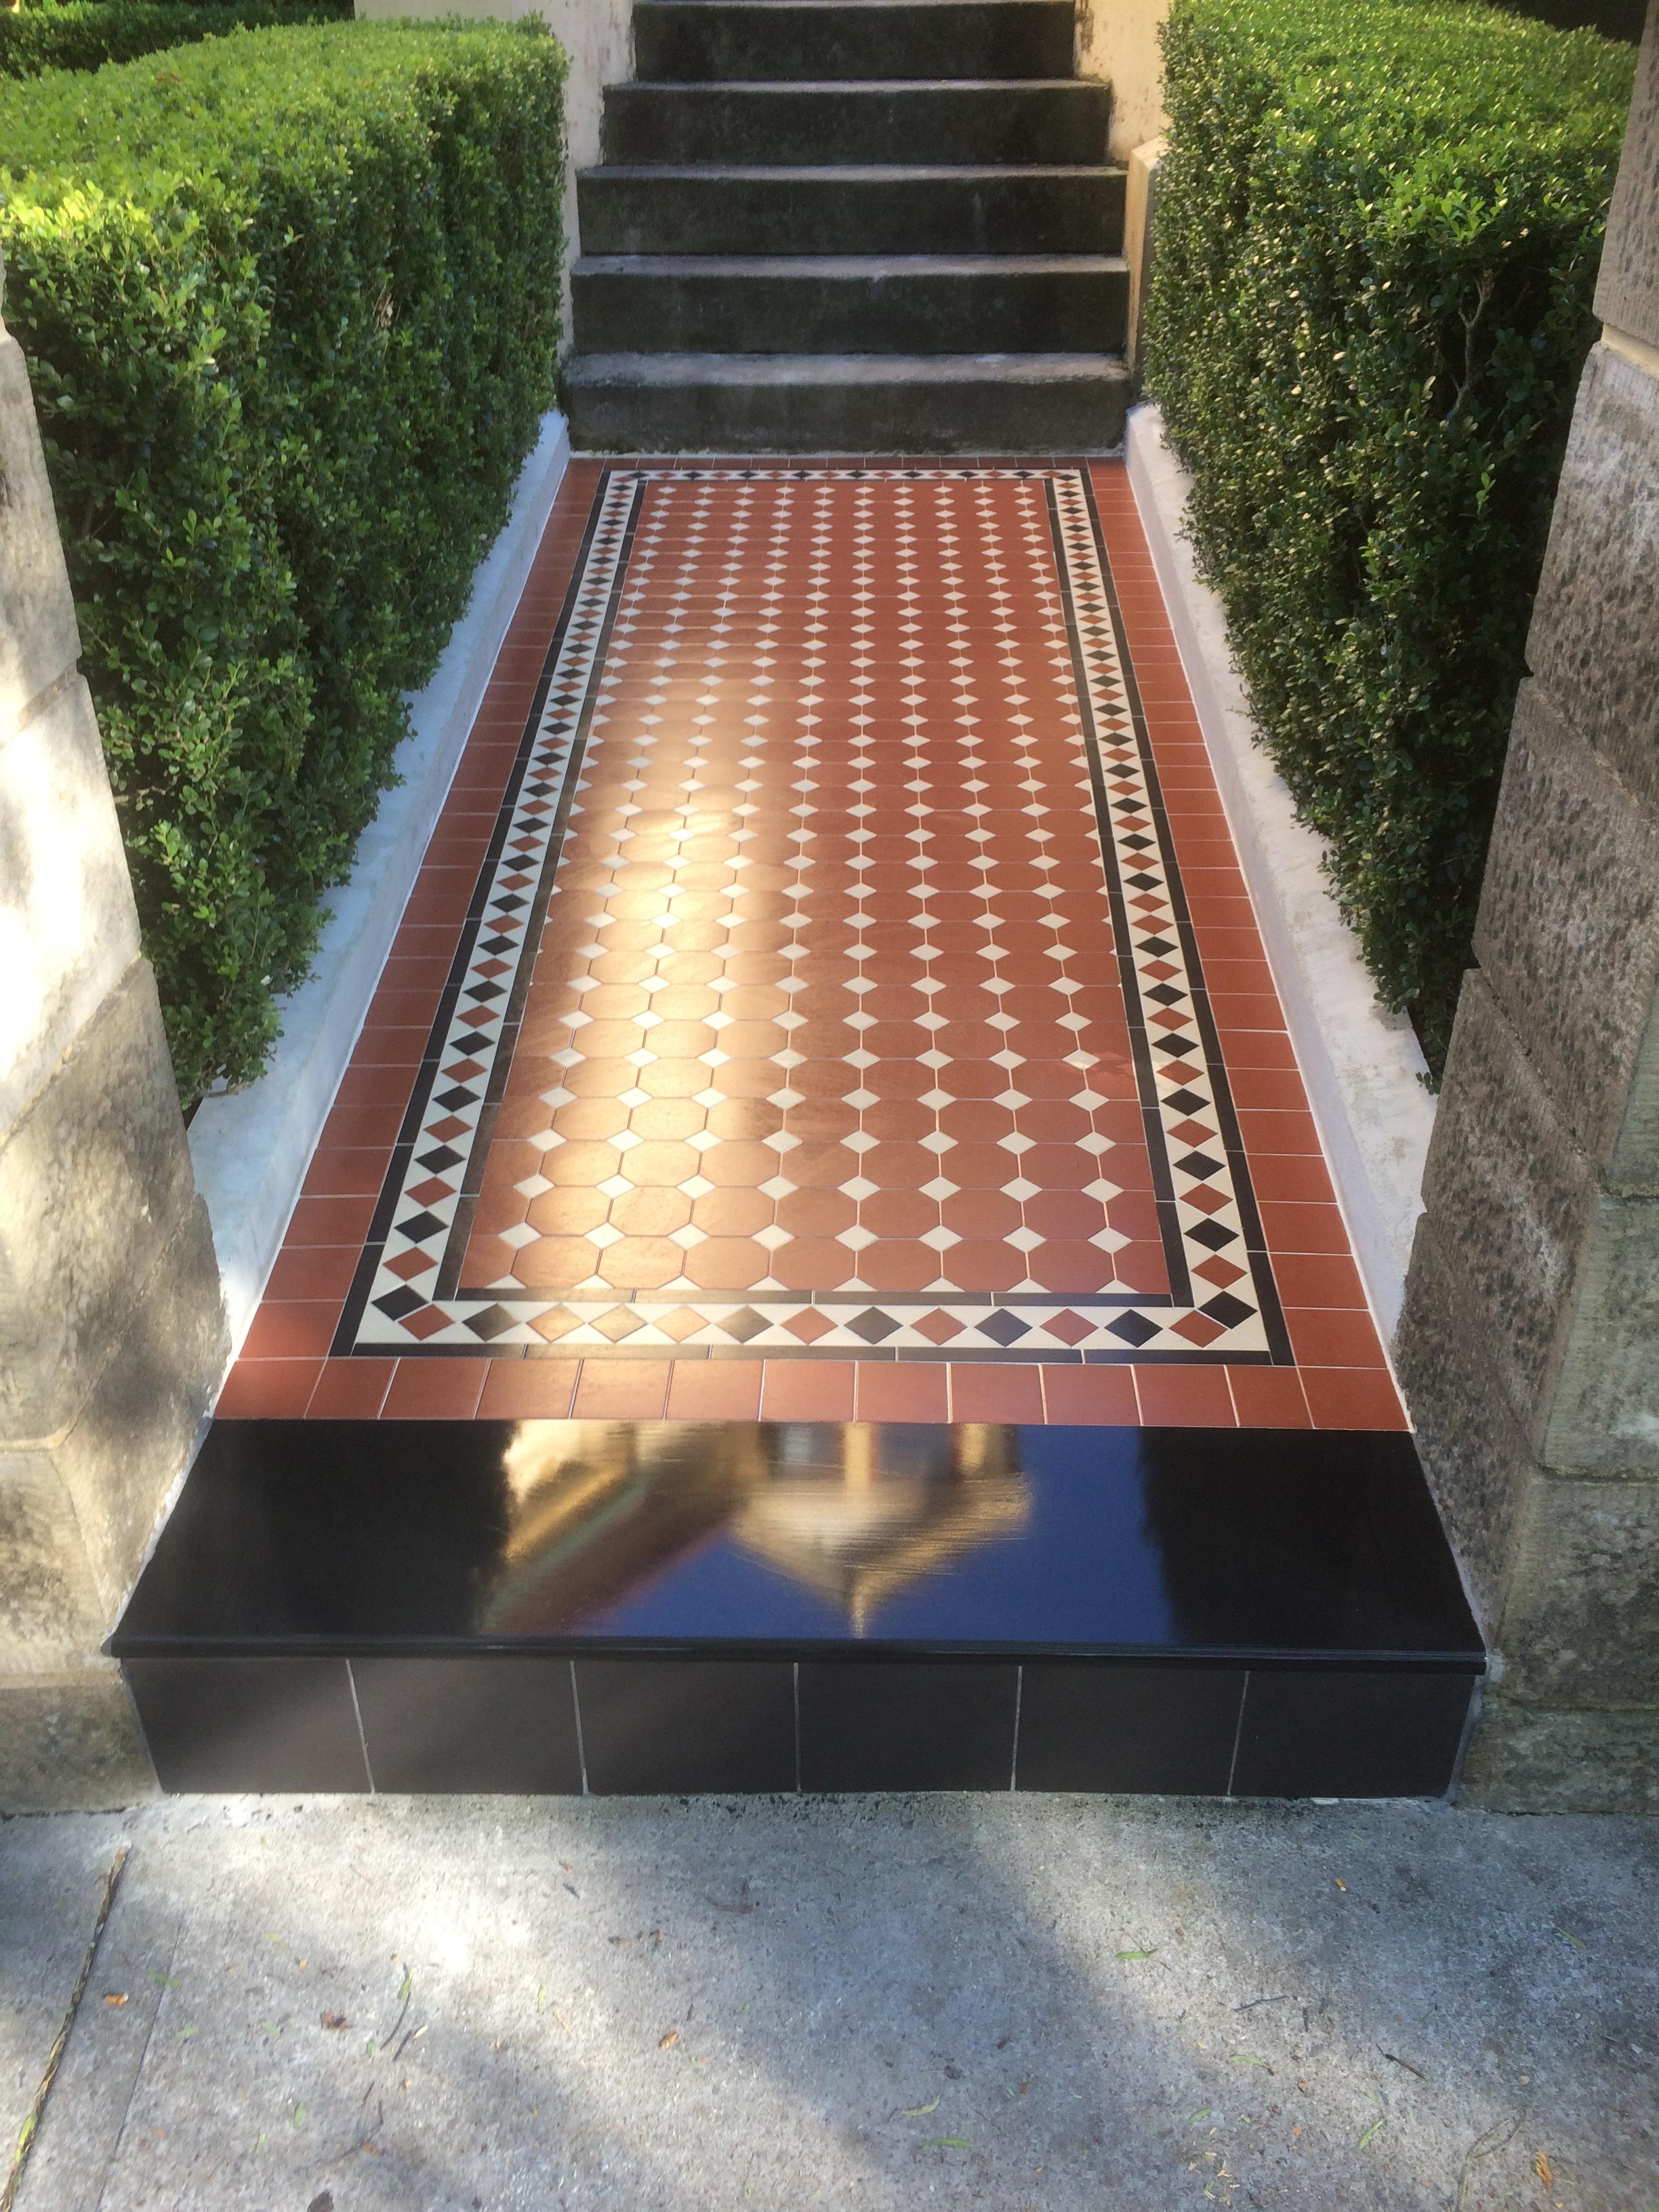 Tessellated Heritage tiling